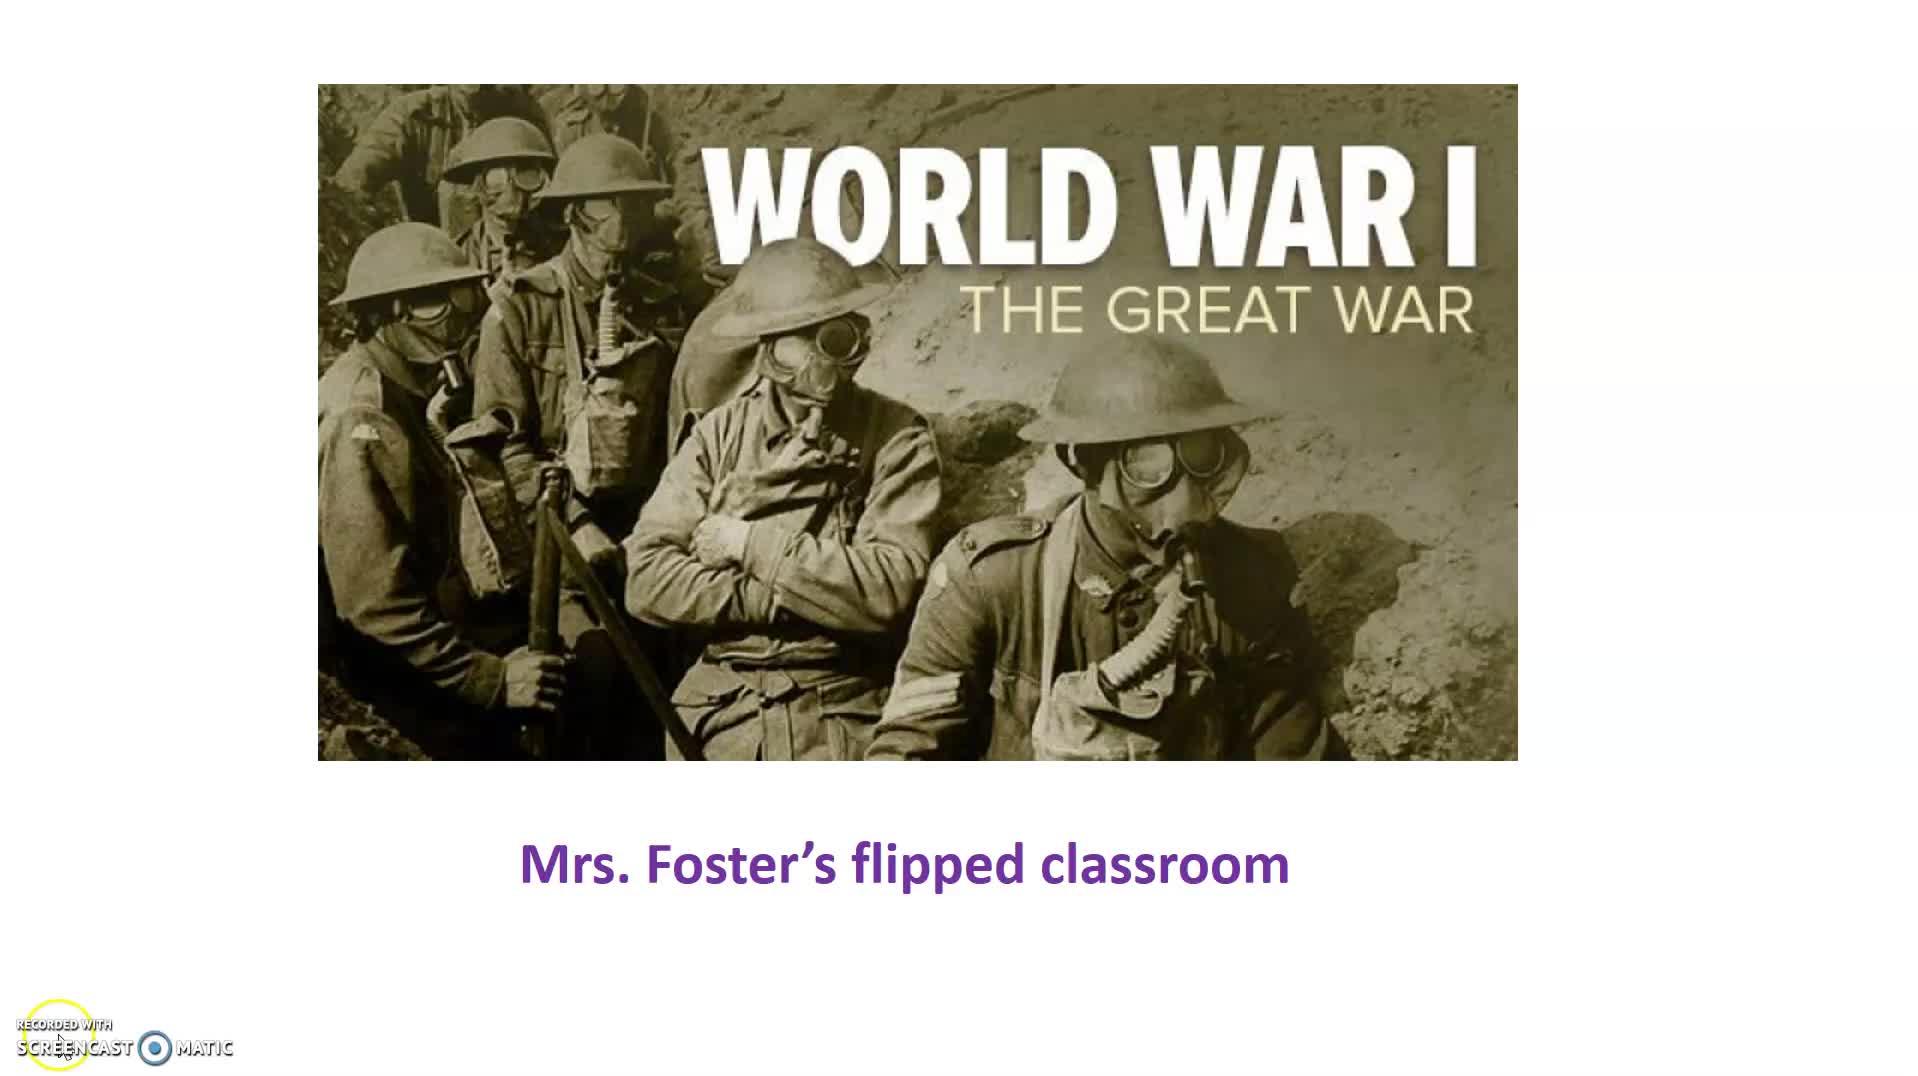 World War I flipped classroom